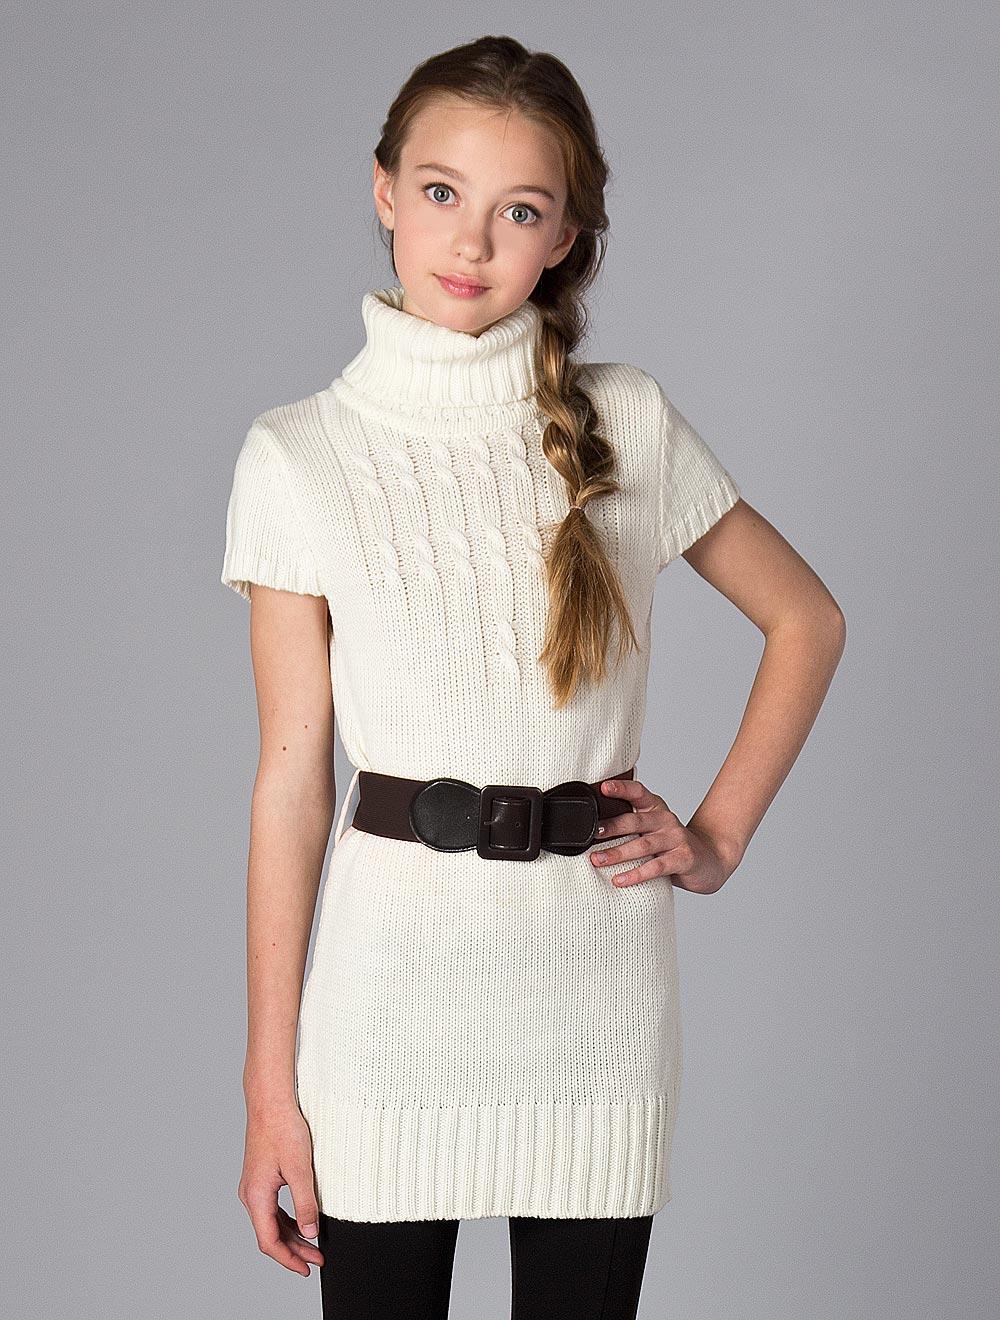 Мода платья 12 лет